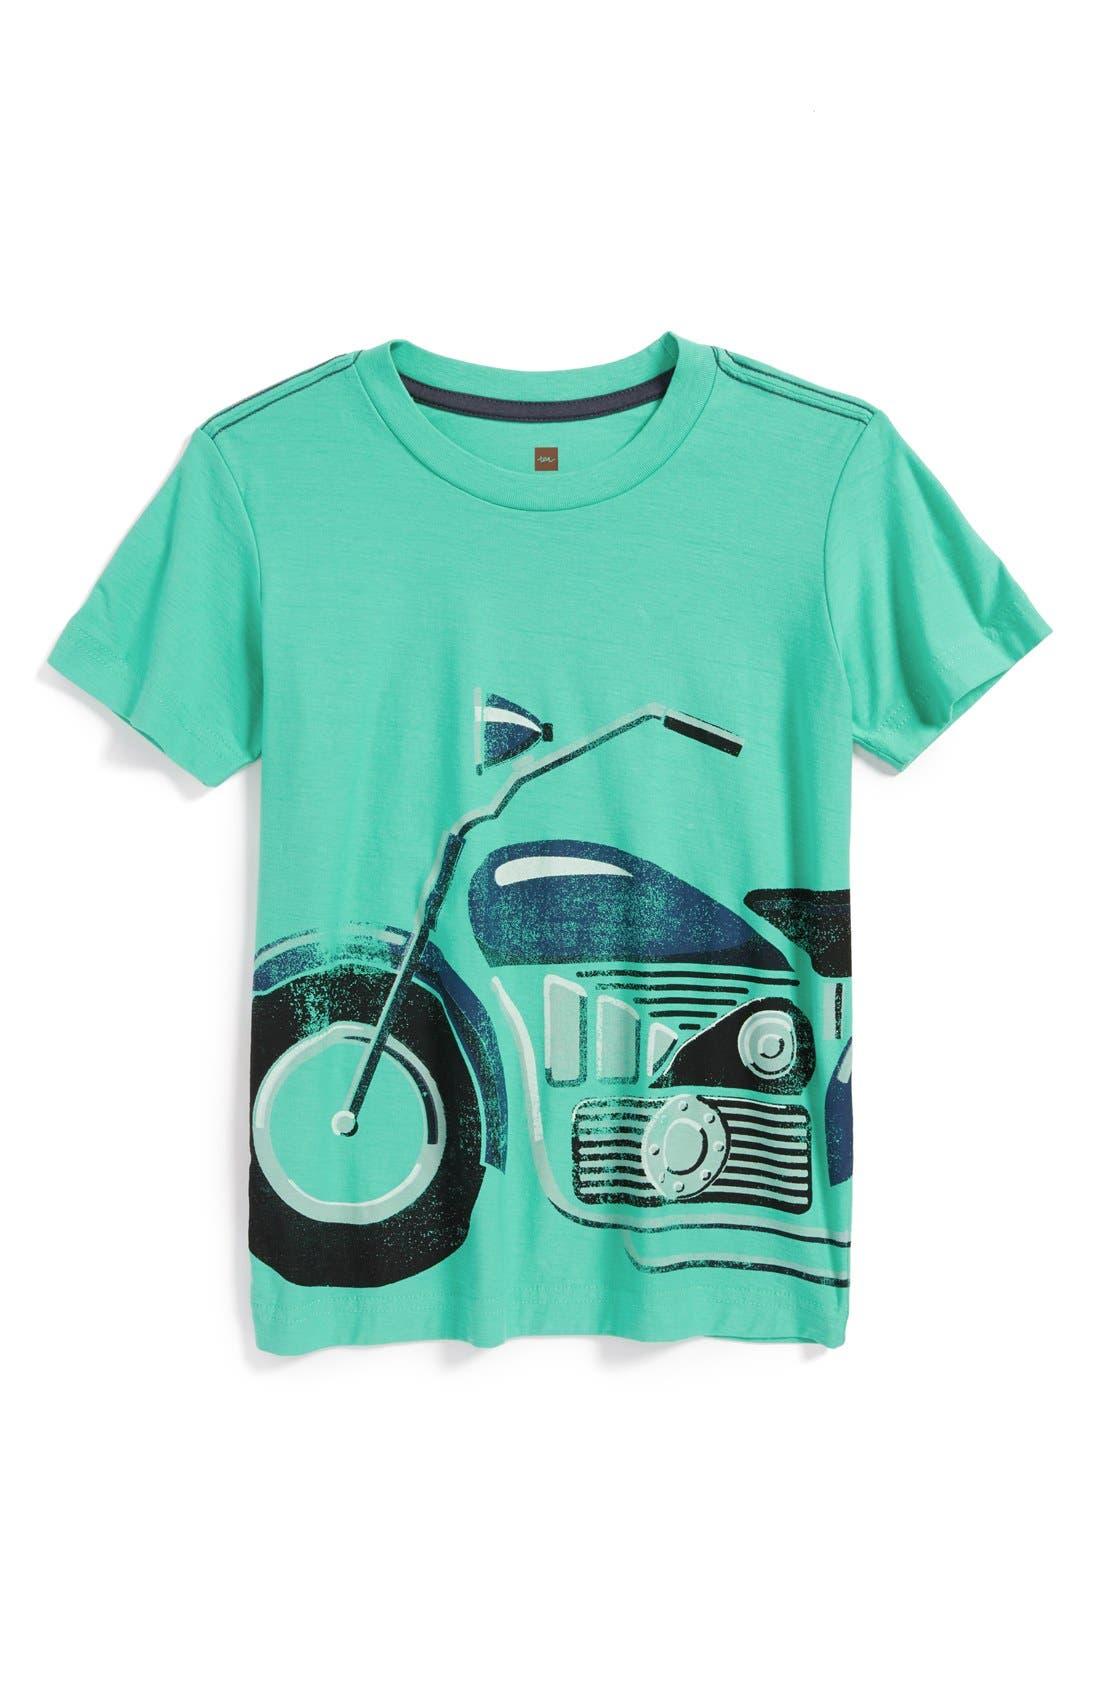 Main Image - Tea Collection 'Motorrad' Graphic T-Shirt (Toddler Boys & Little Boys)